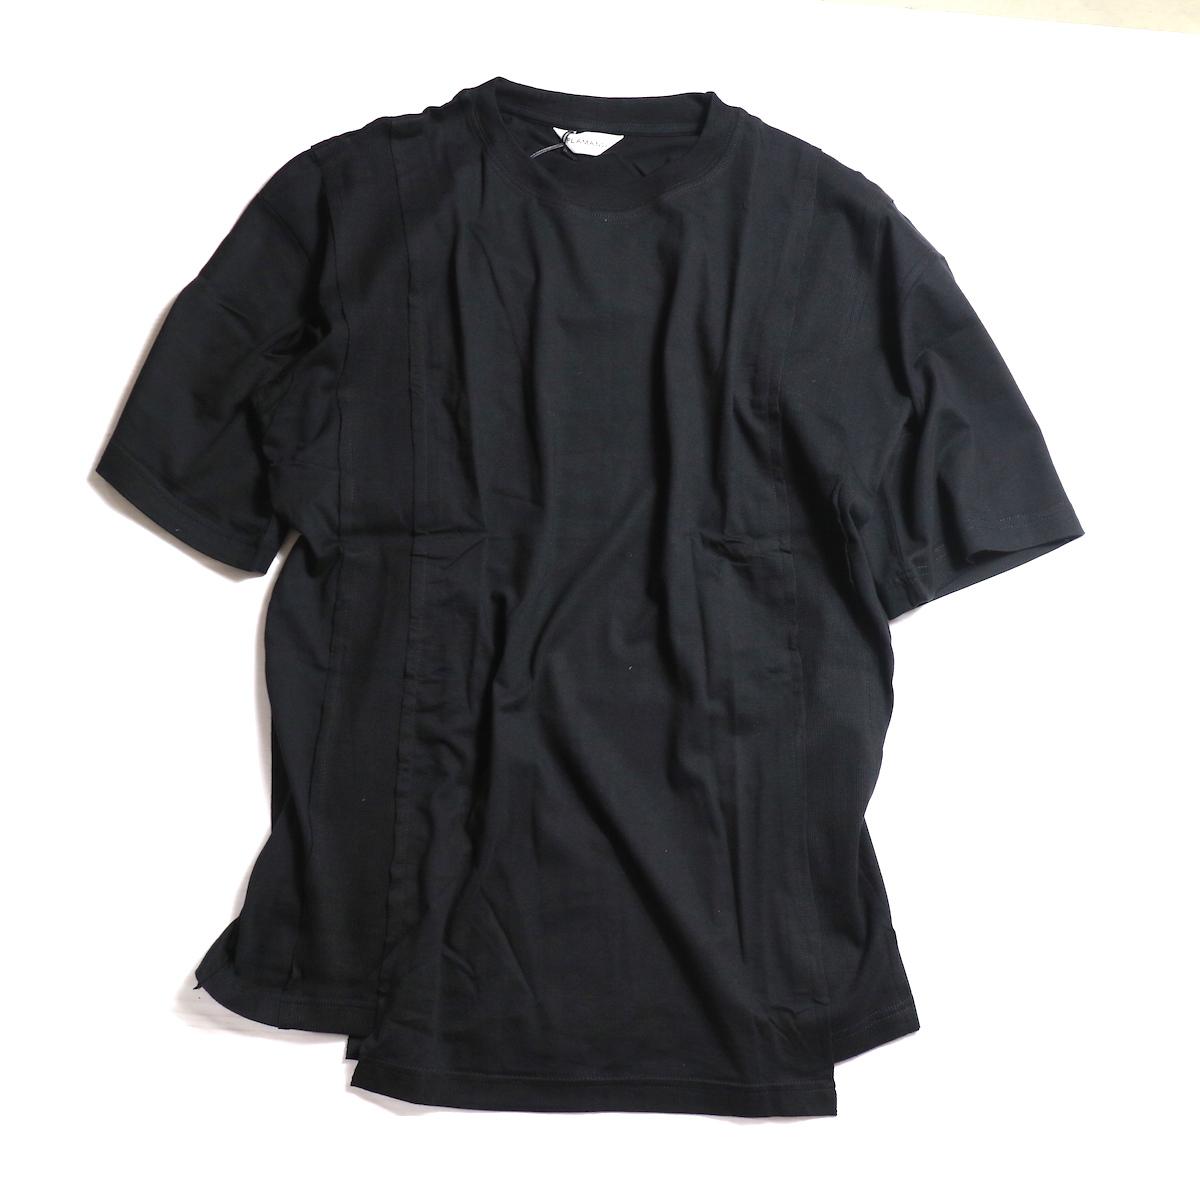 FLAMAND / Panel Tee Solid -Noir(Black)